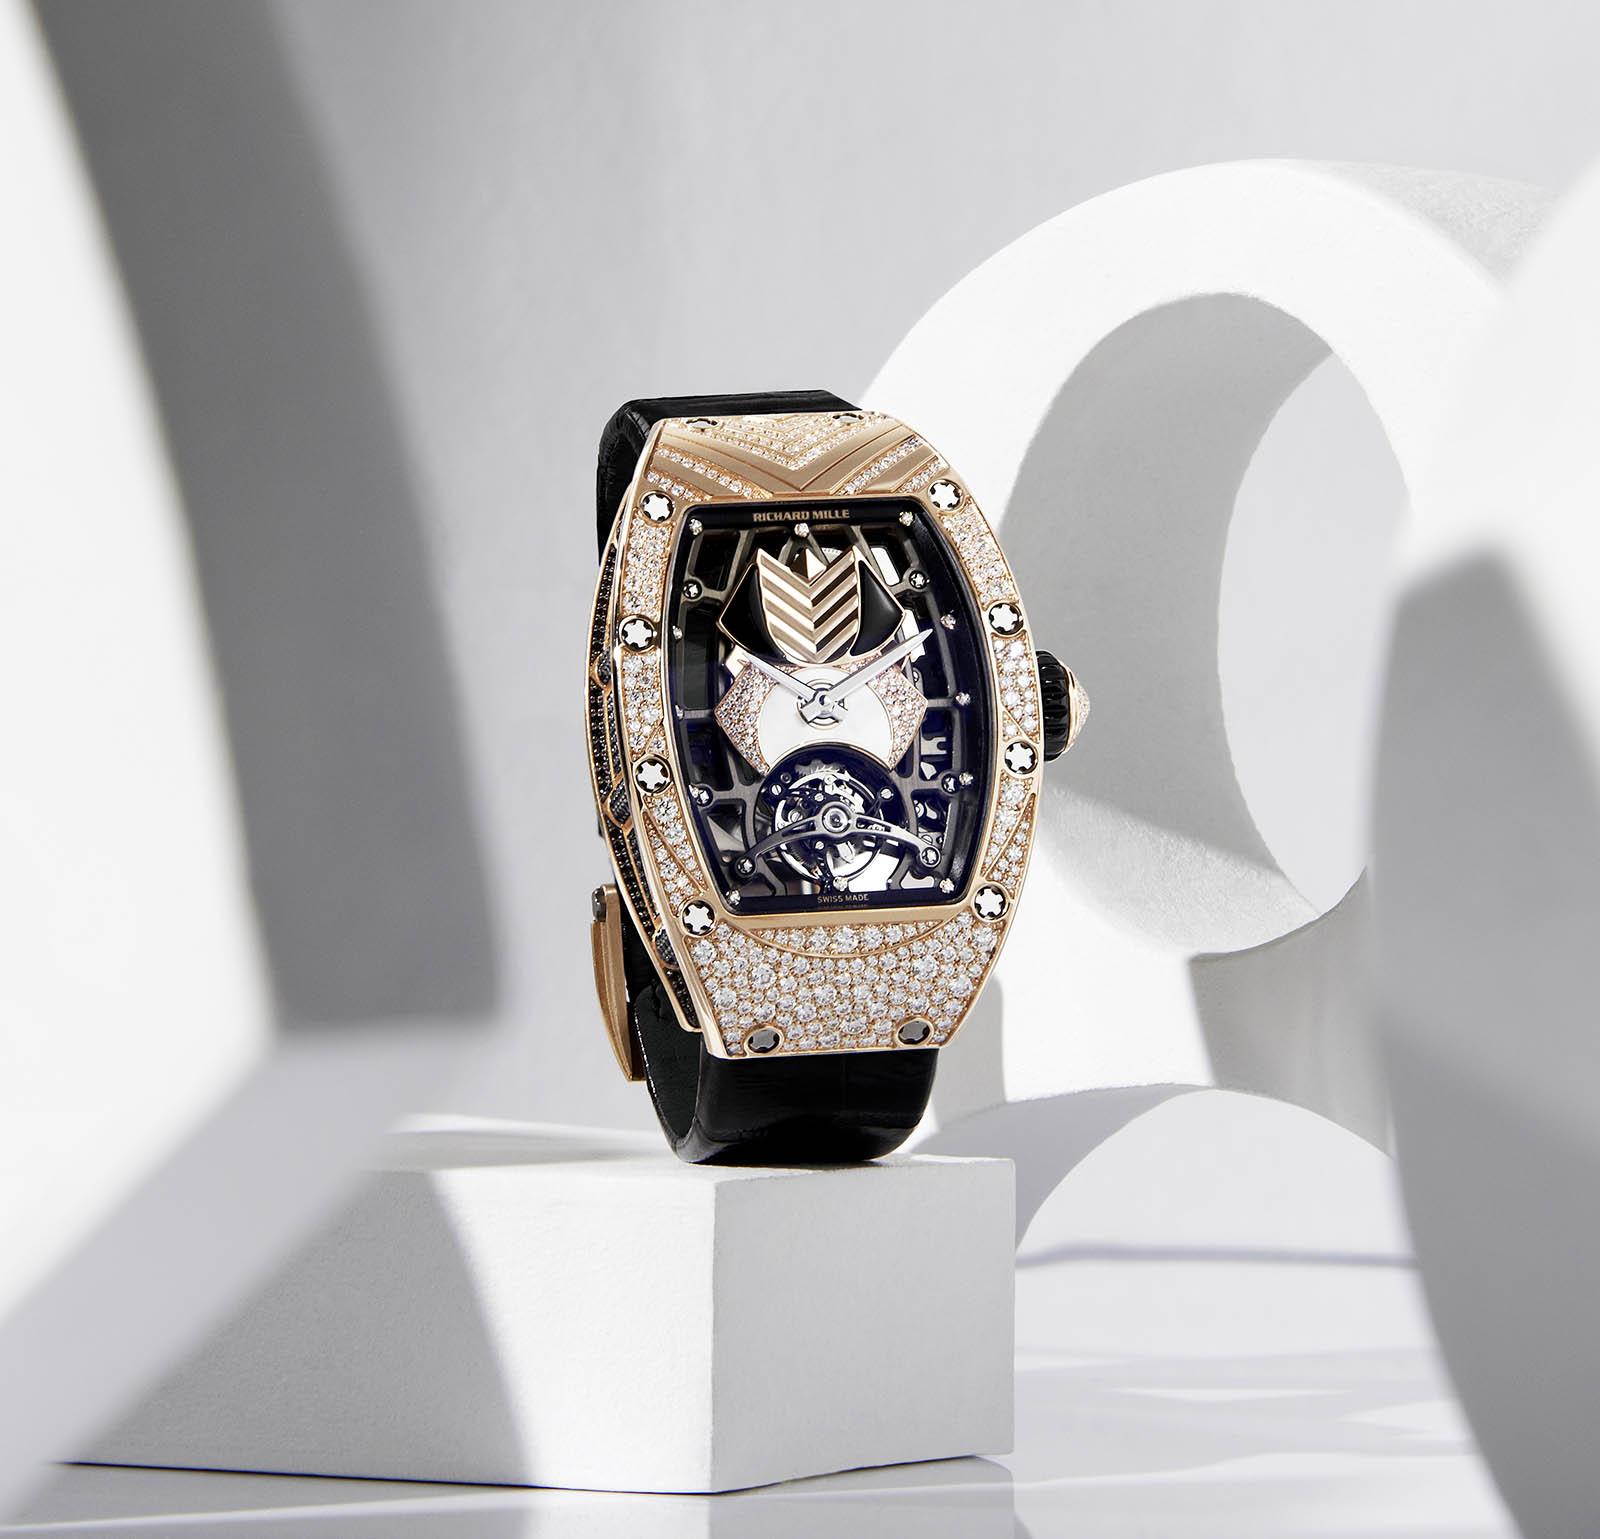 Richard Mille RM71-01 Automatic Tourbillon Talisman